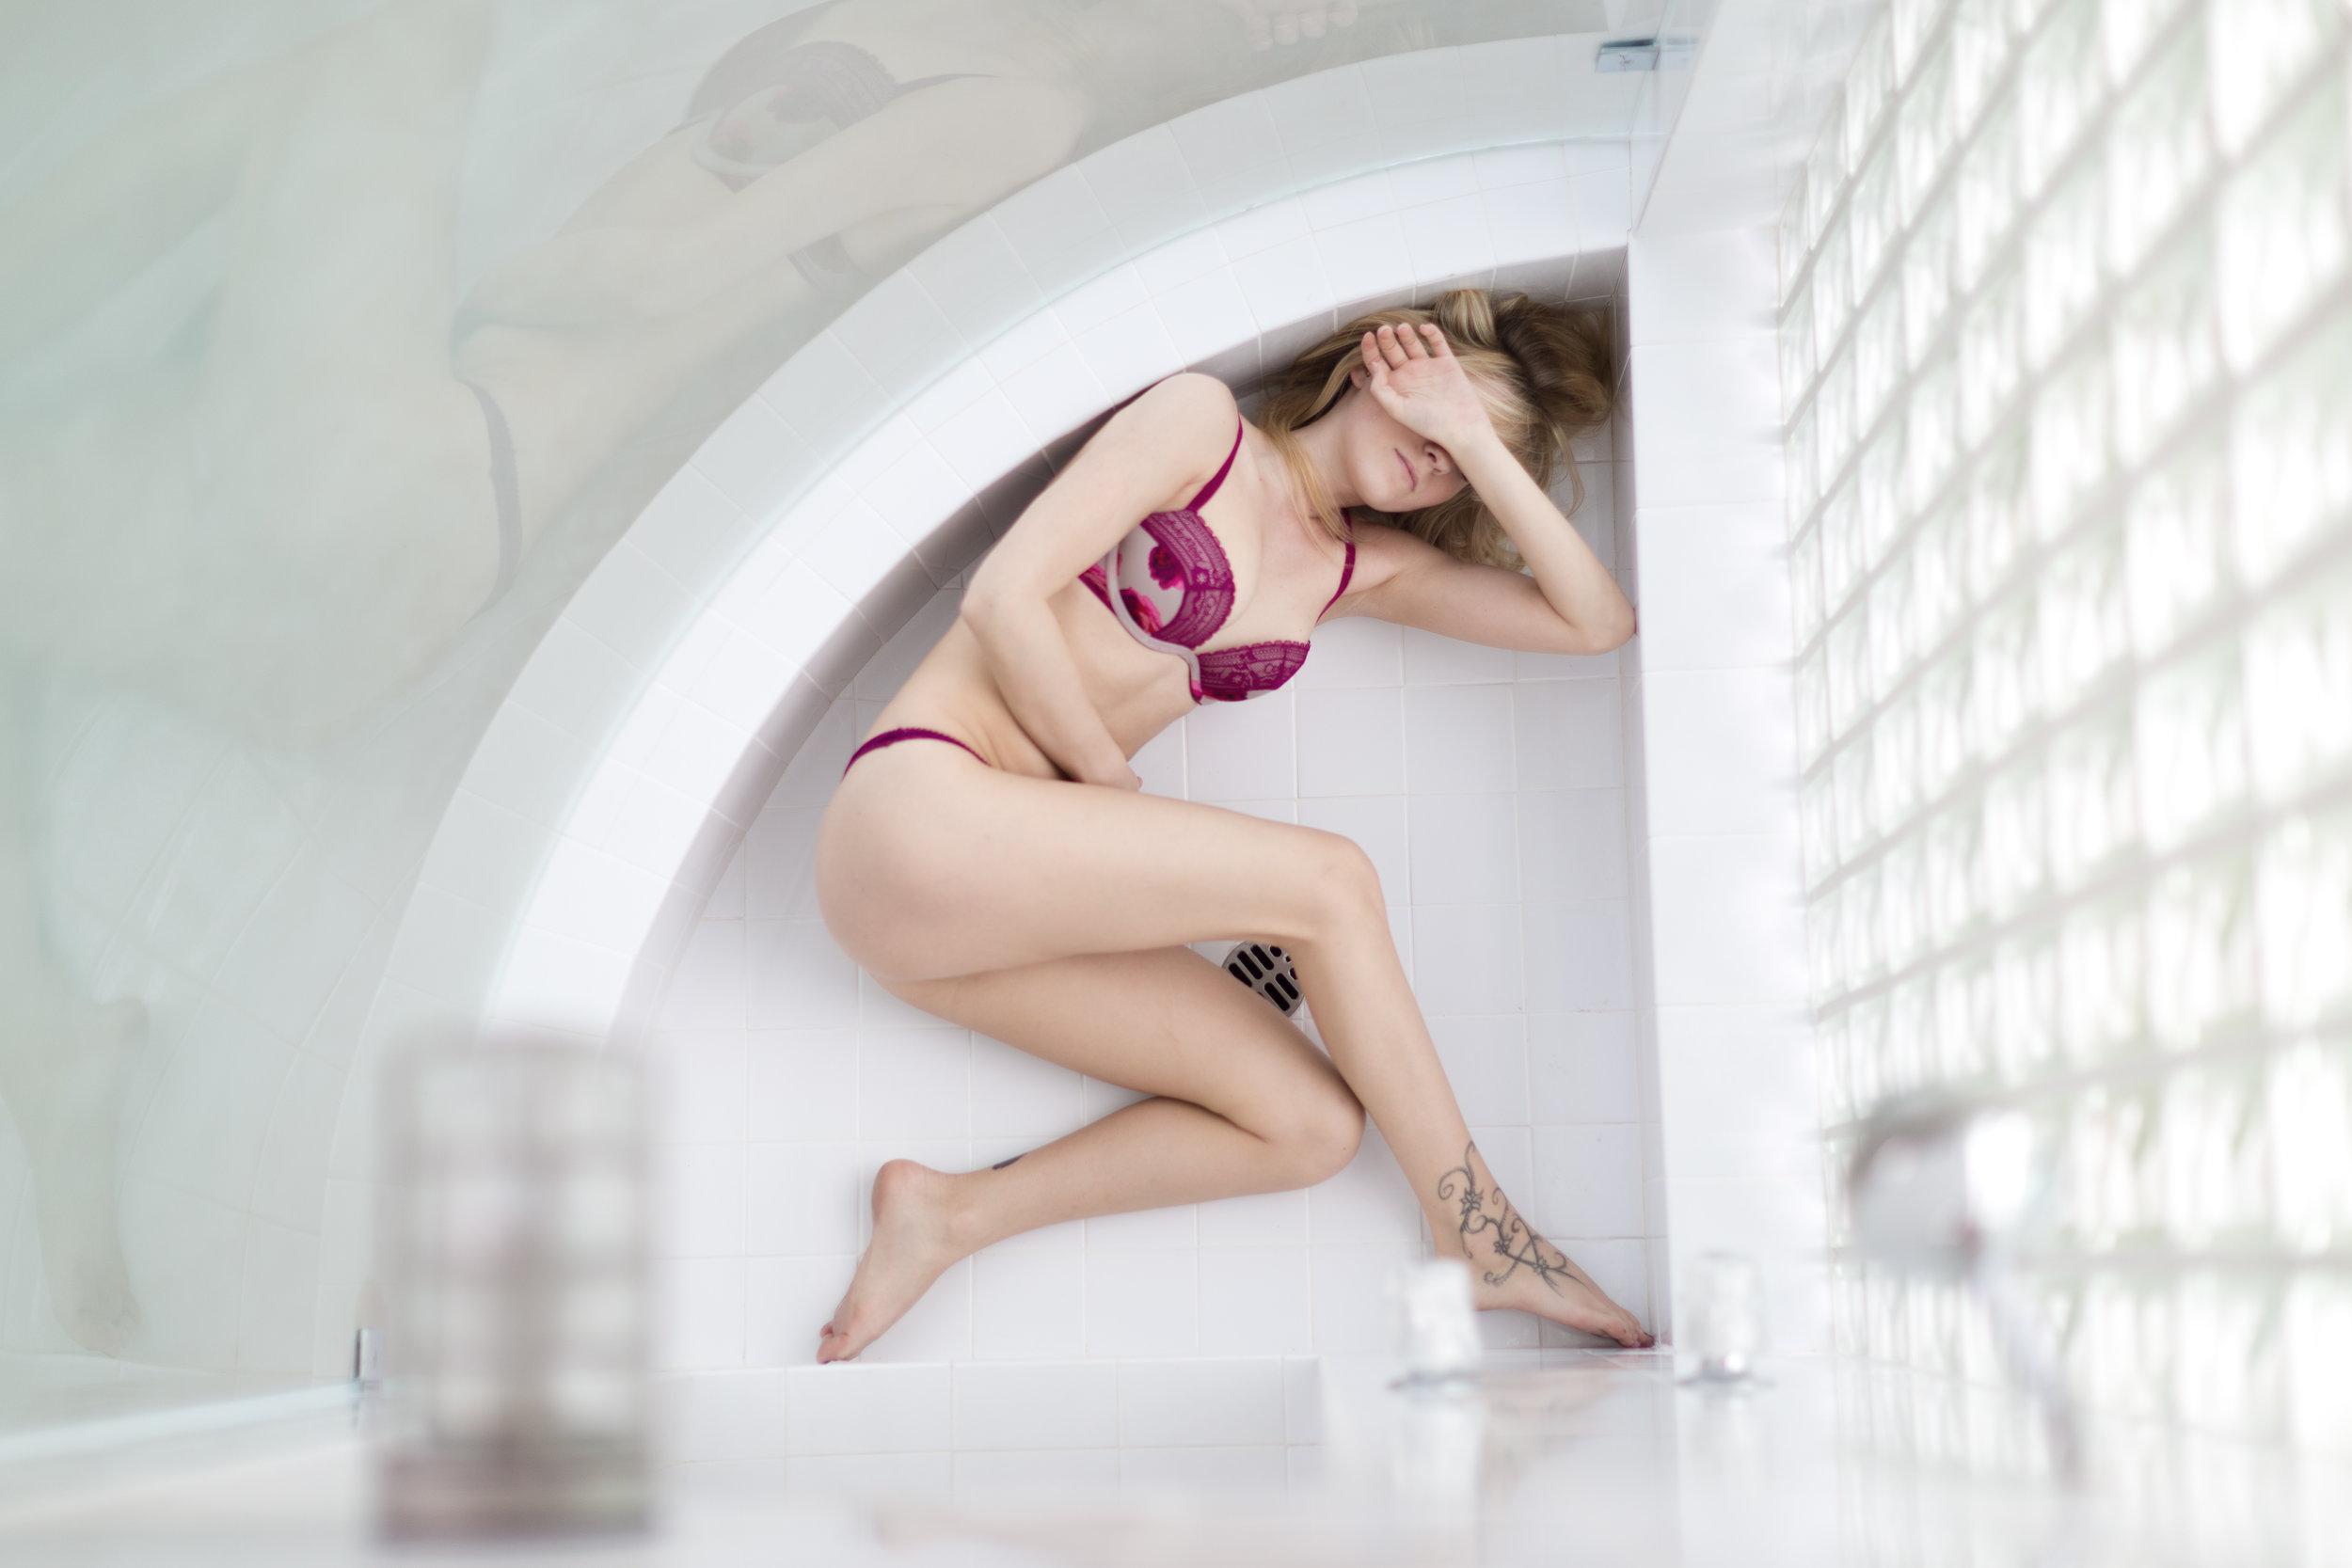 Shower_Taylor_Final.jpg